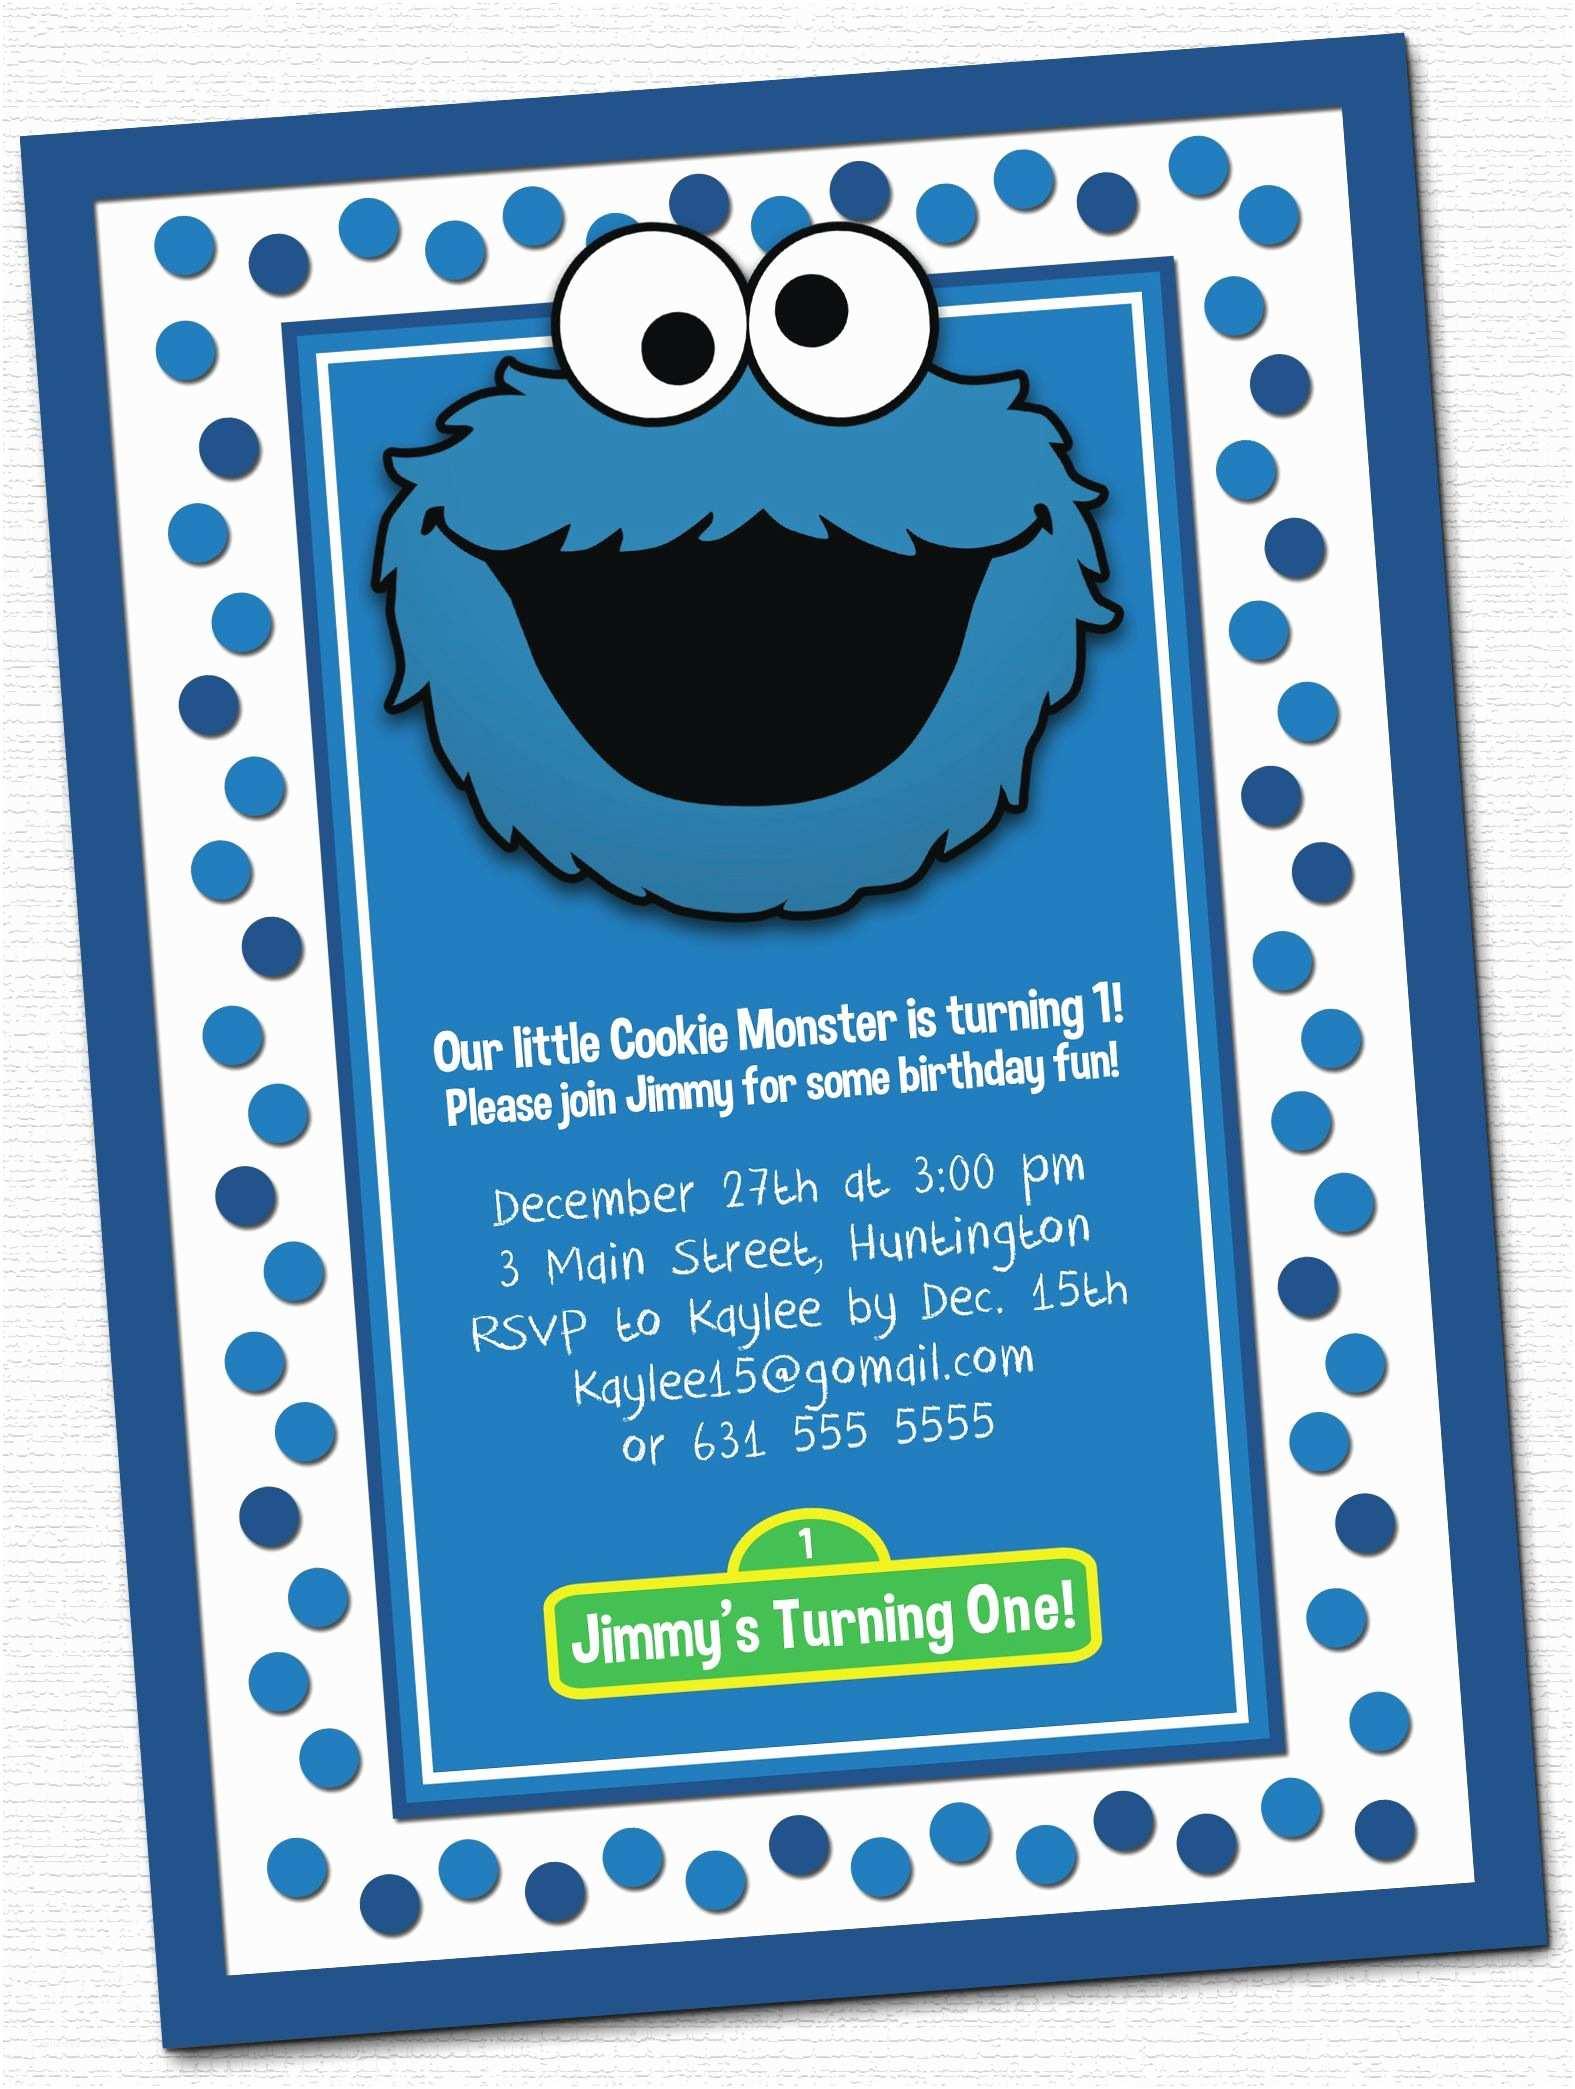 Cookie Monster Birthday Invitations Cookie Monster Invitations Little Rj